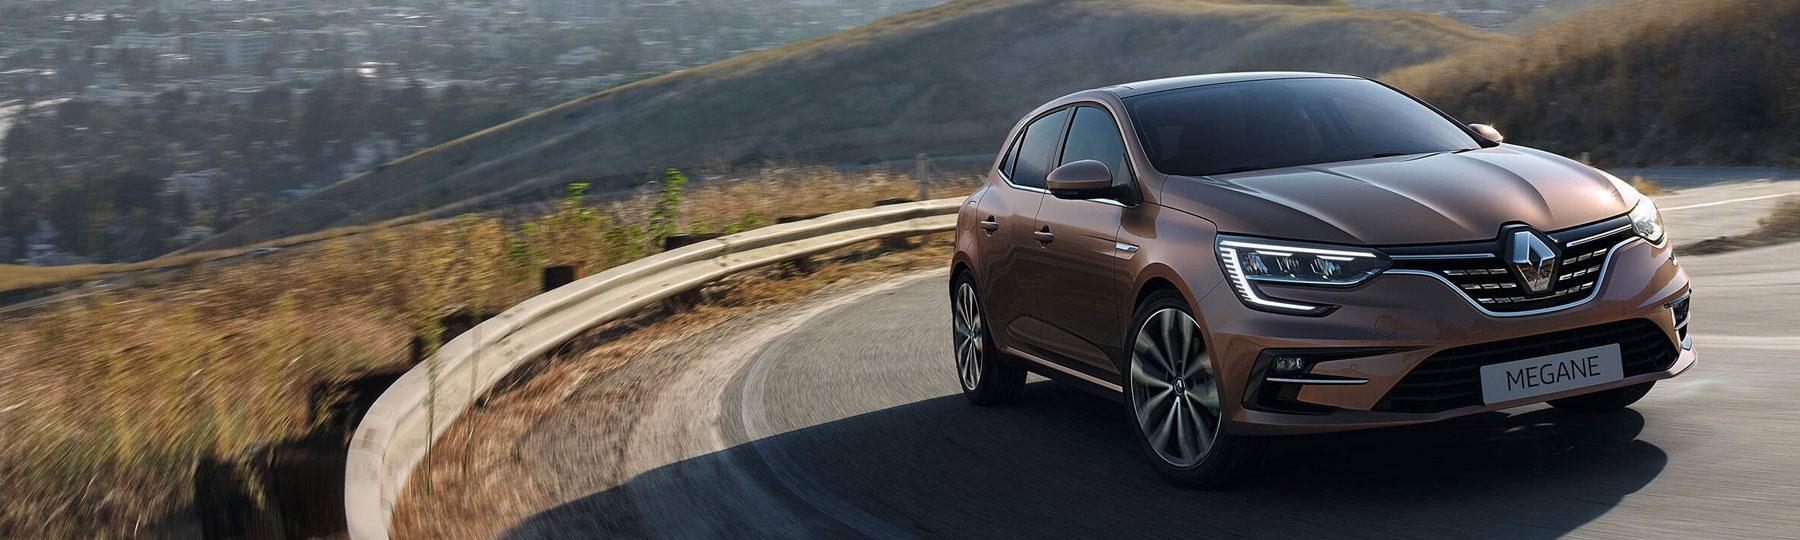 All-New Renault MEGANE